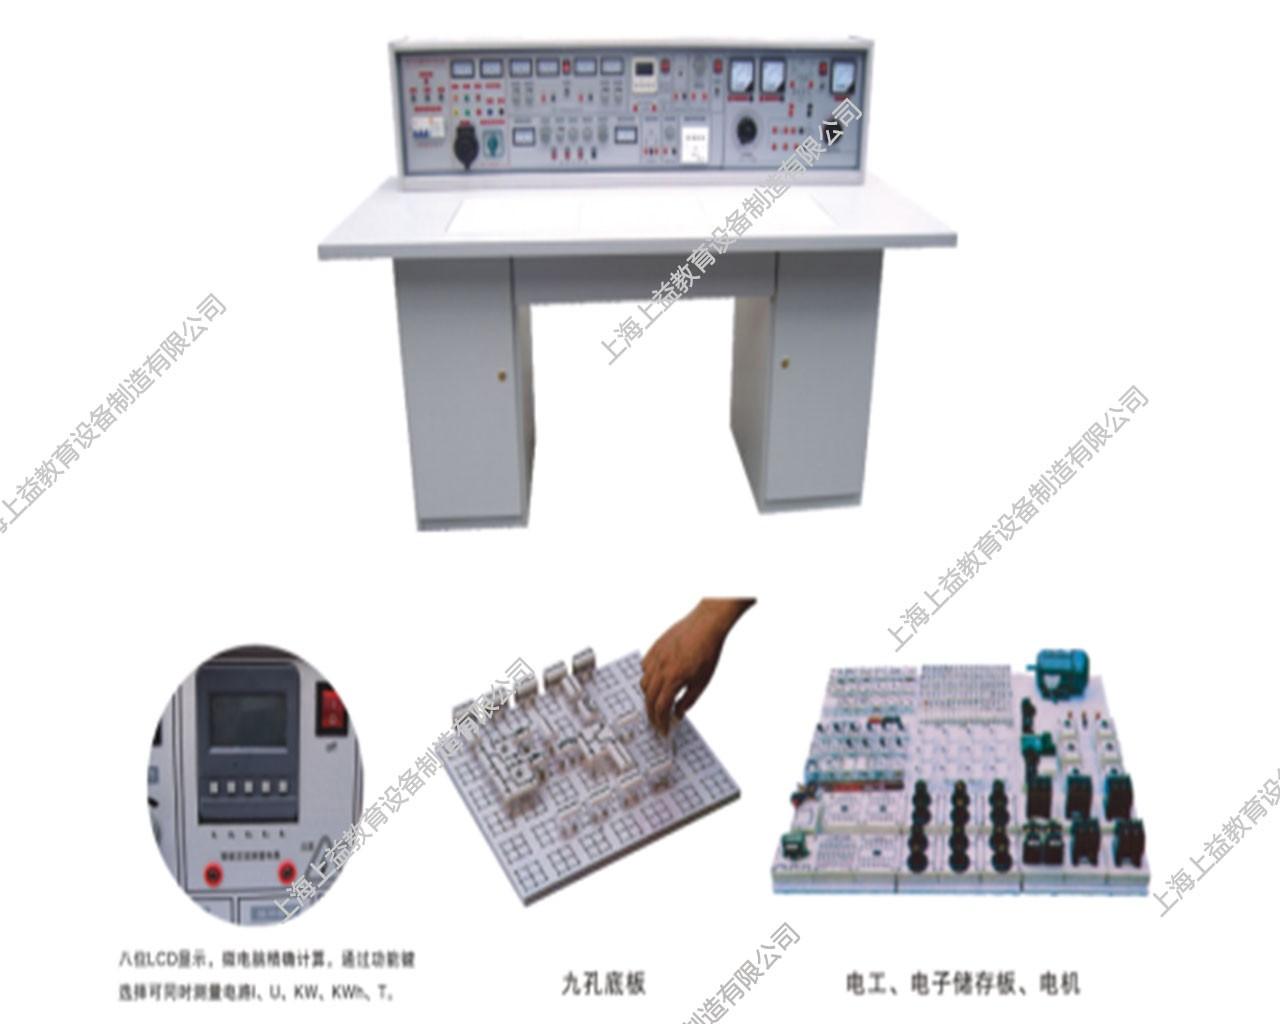 SYTY-181F通用智能型电工、电子、电拖(带直流电机实验,三相0–450V可调变压器)四合一实验室成套设备(带智能表,元件盒透明)